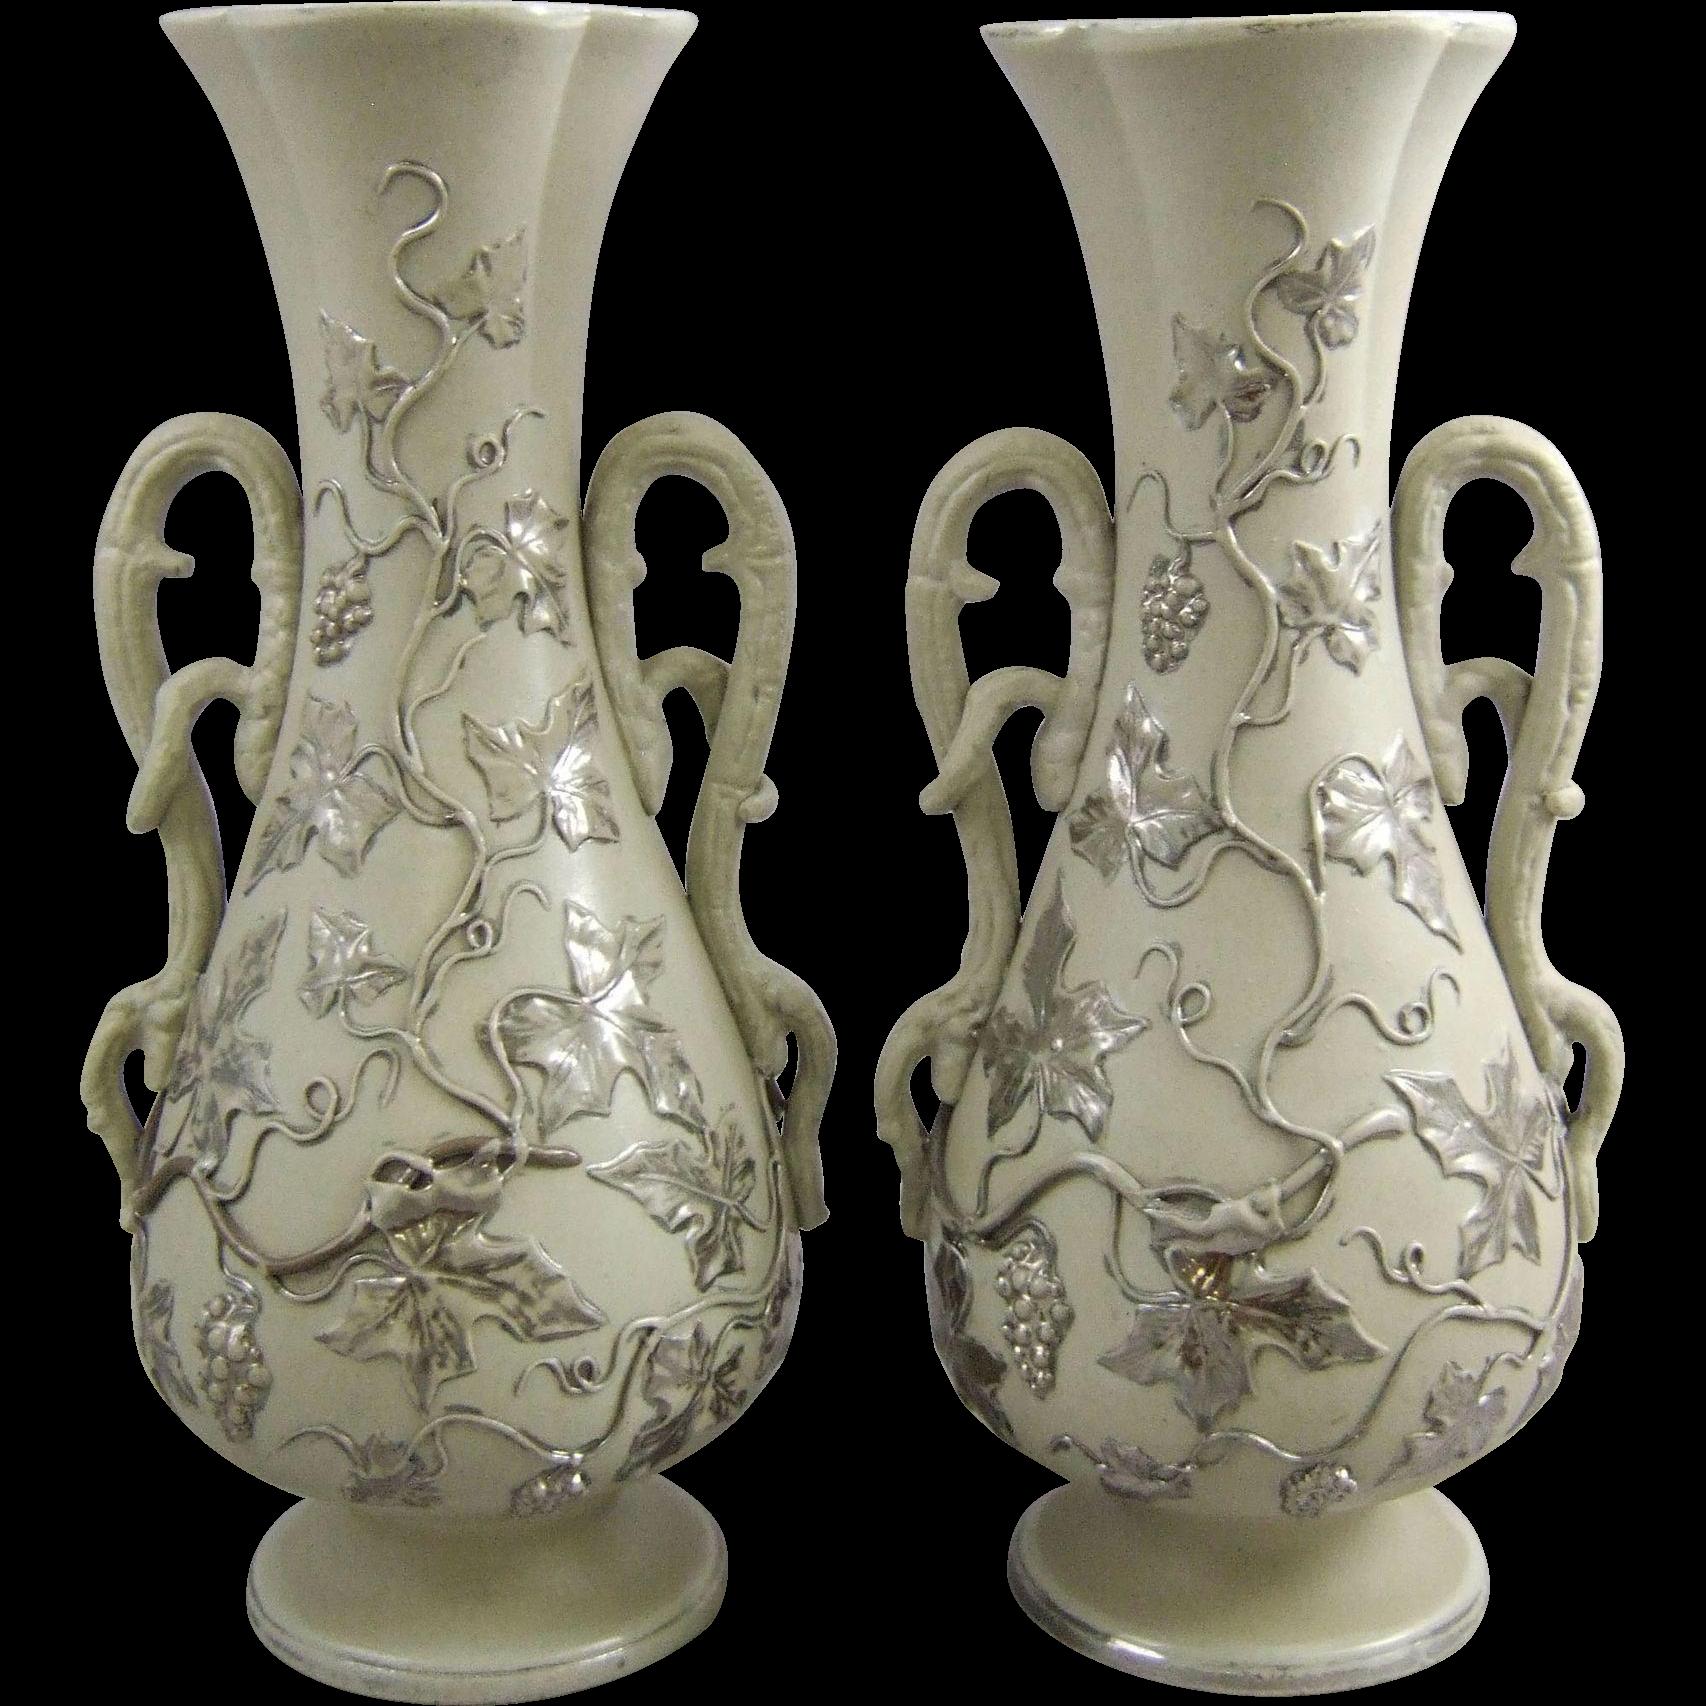 Antique villeroy boch mettlach ceramic pottery mantle vases with antique villeroy boch mettlach ceramic pottery mantle vases with green country estates tulsa antiques llc ruby lane reviewsmspy